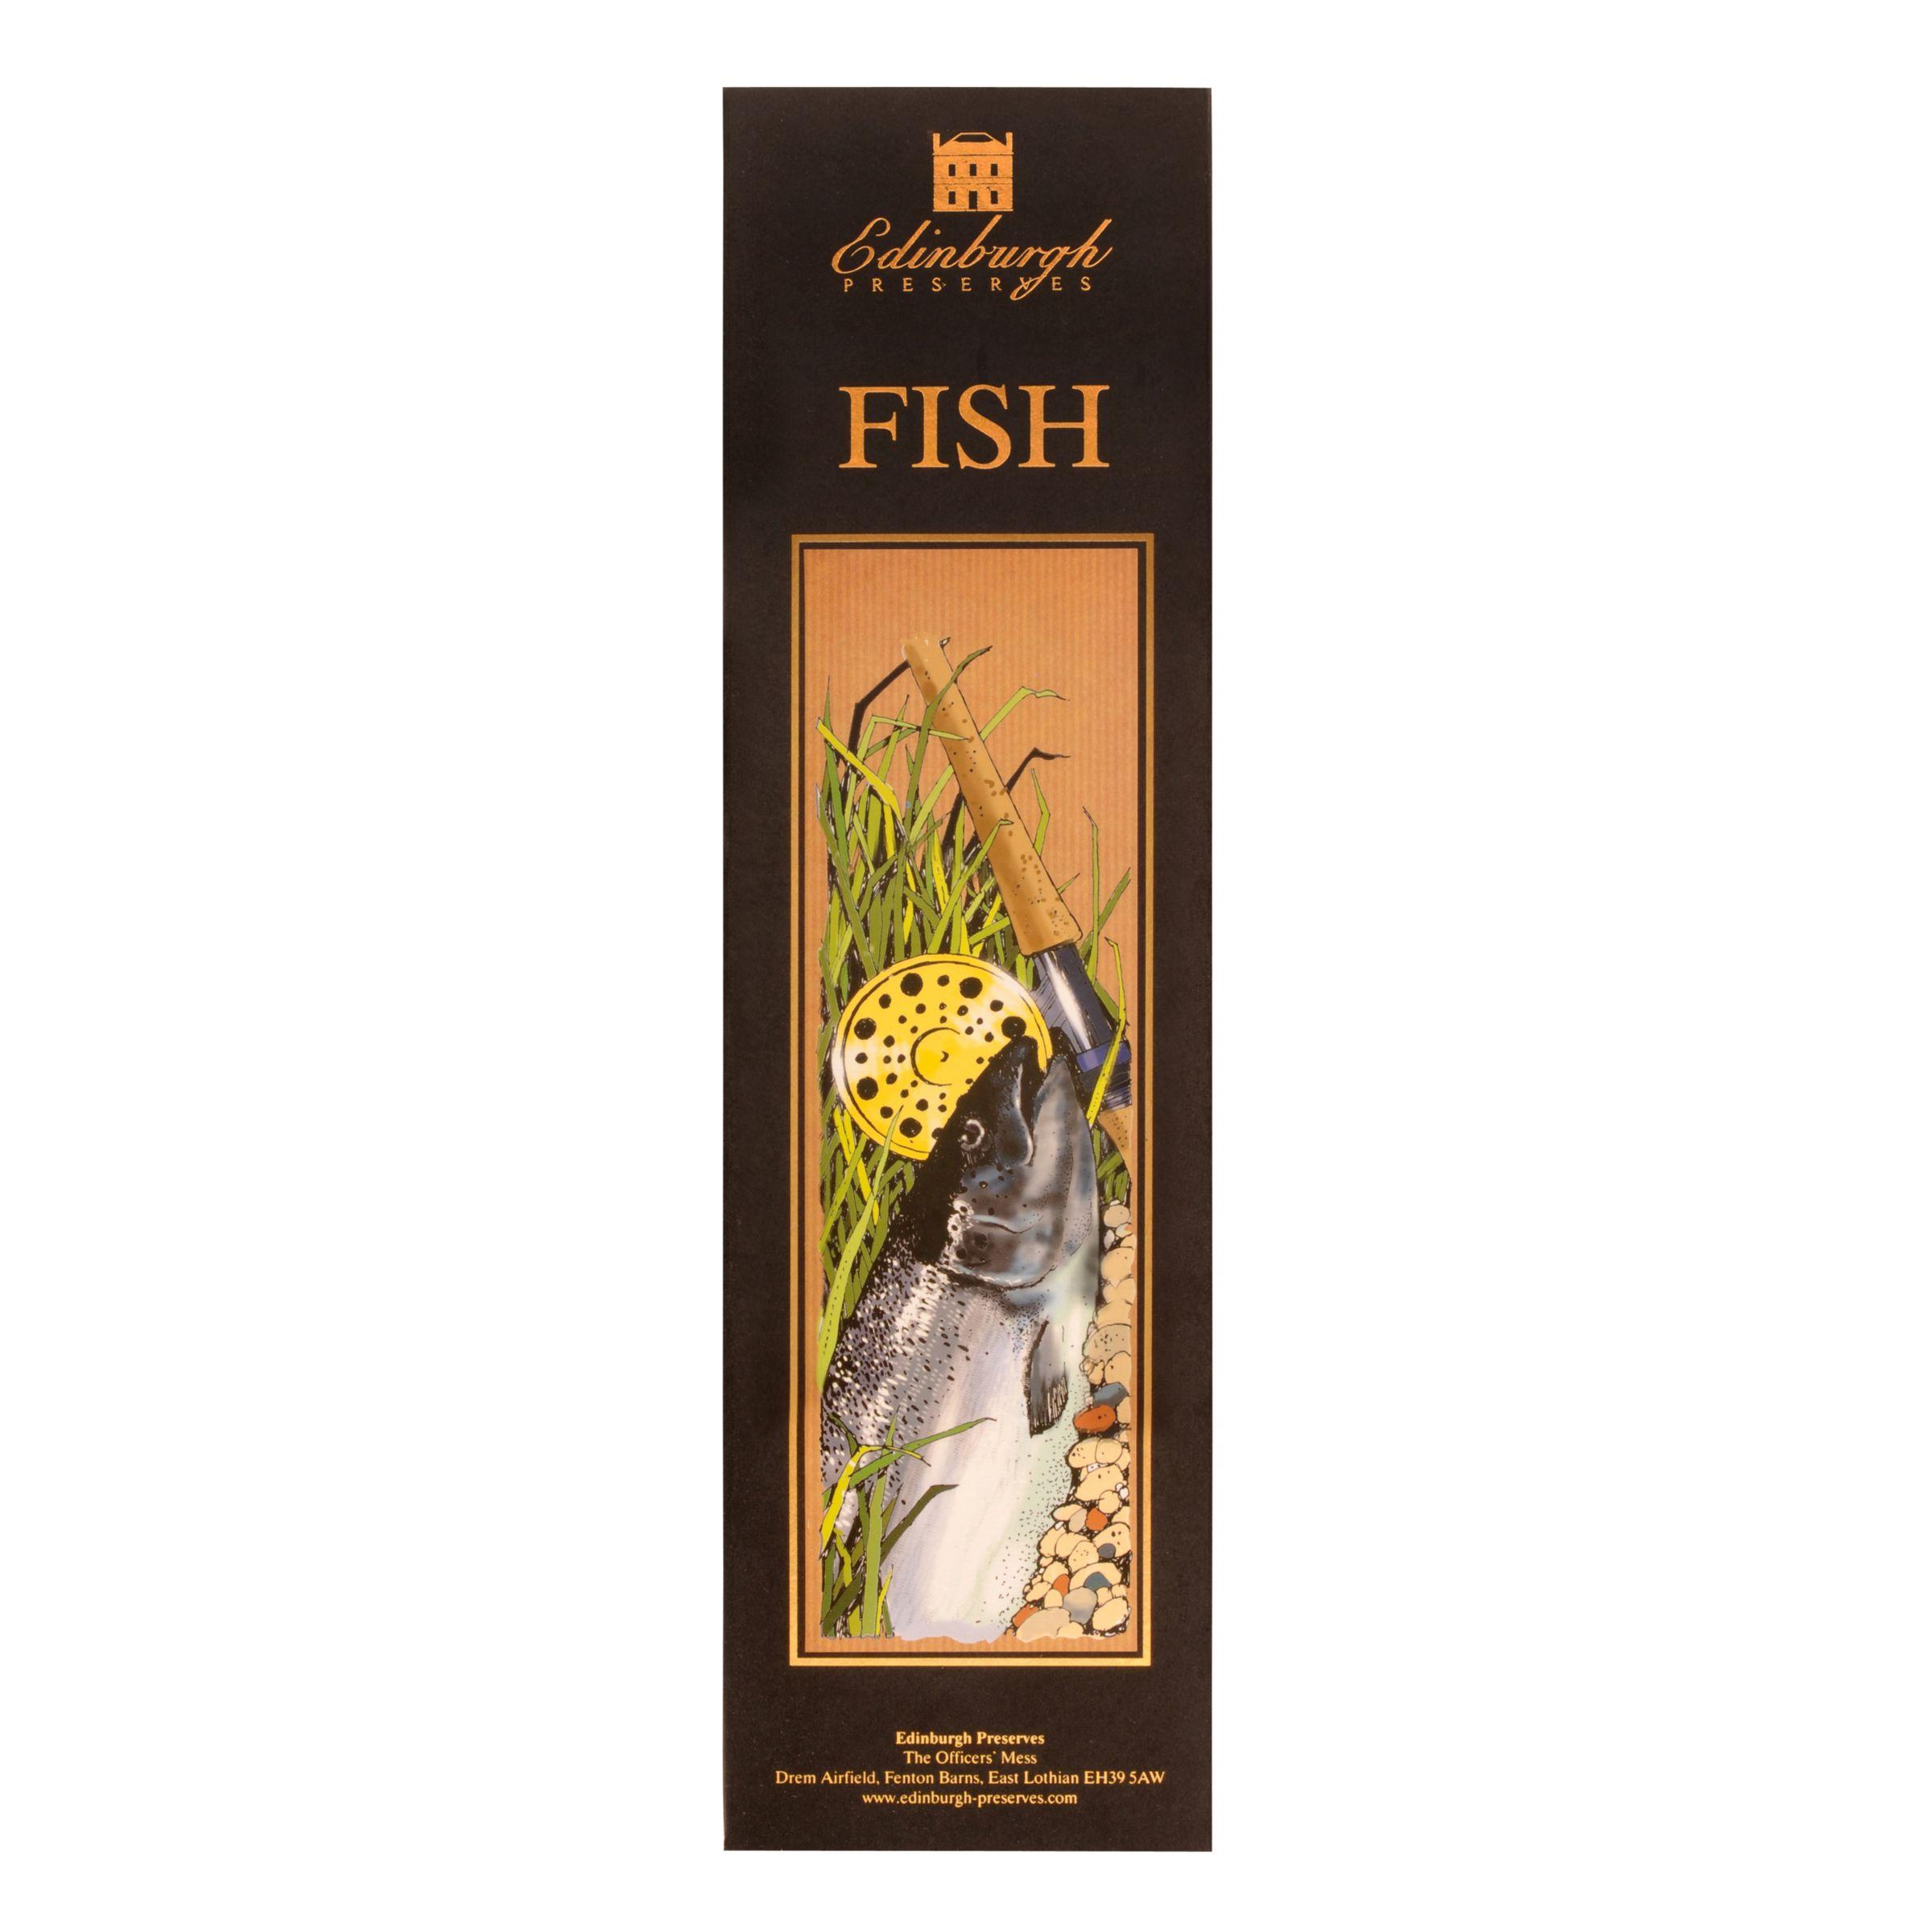 Edinburgh Preserves Edinburgh Preserves 'Fish' Accompaniments Set, 478g